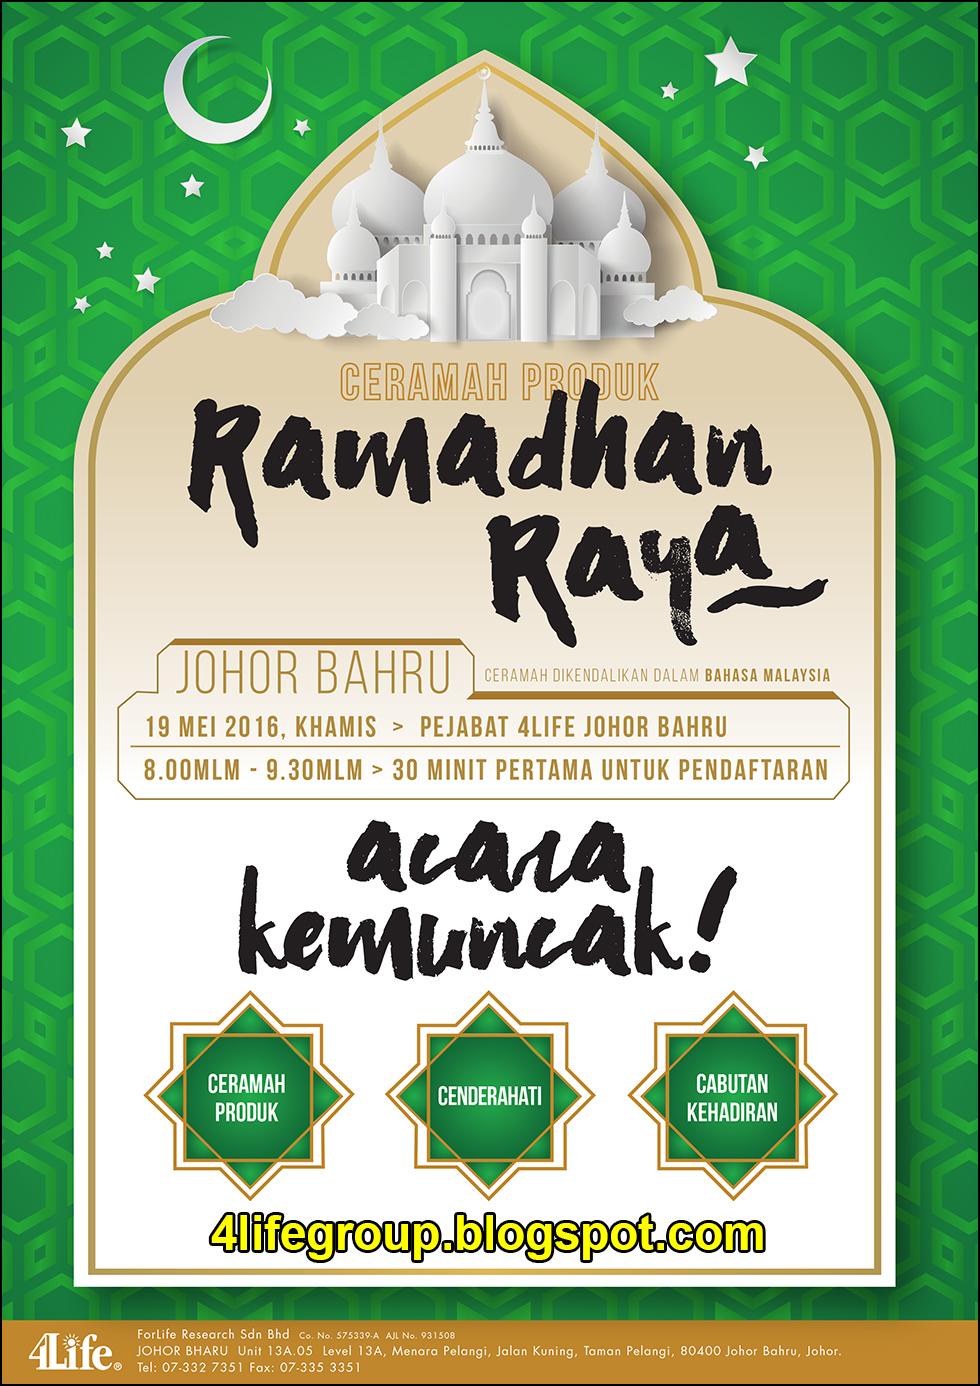 foto Ceramah Produk Ramadhan Raya 4Life Johor Bahru 2016